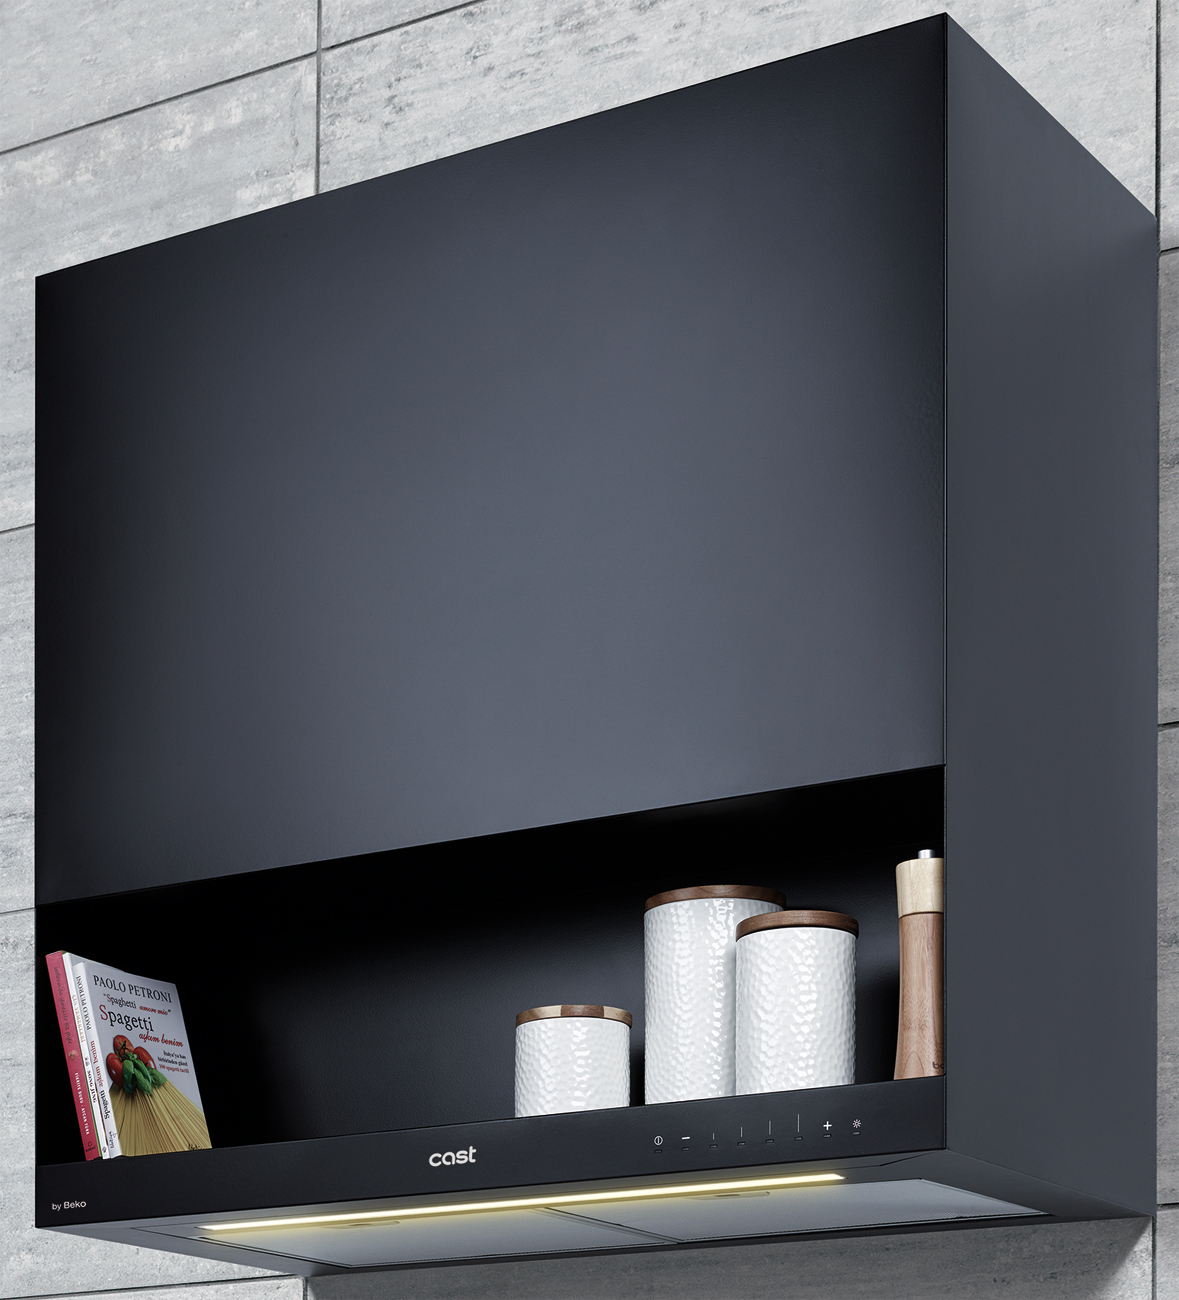 beko dunstabzugshaube cwb 9831 anp wandabzugshaube mit 4 l fterstufen. Black Bedroom Furniture Sets. Home Design Ideas